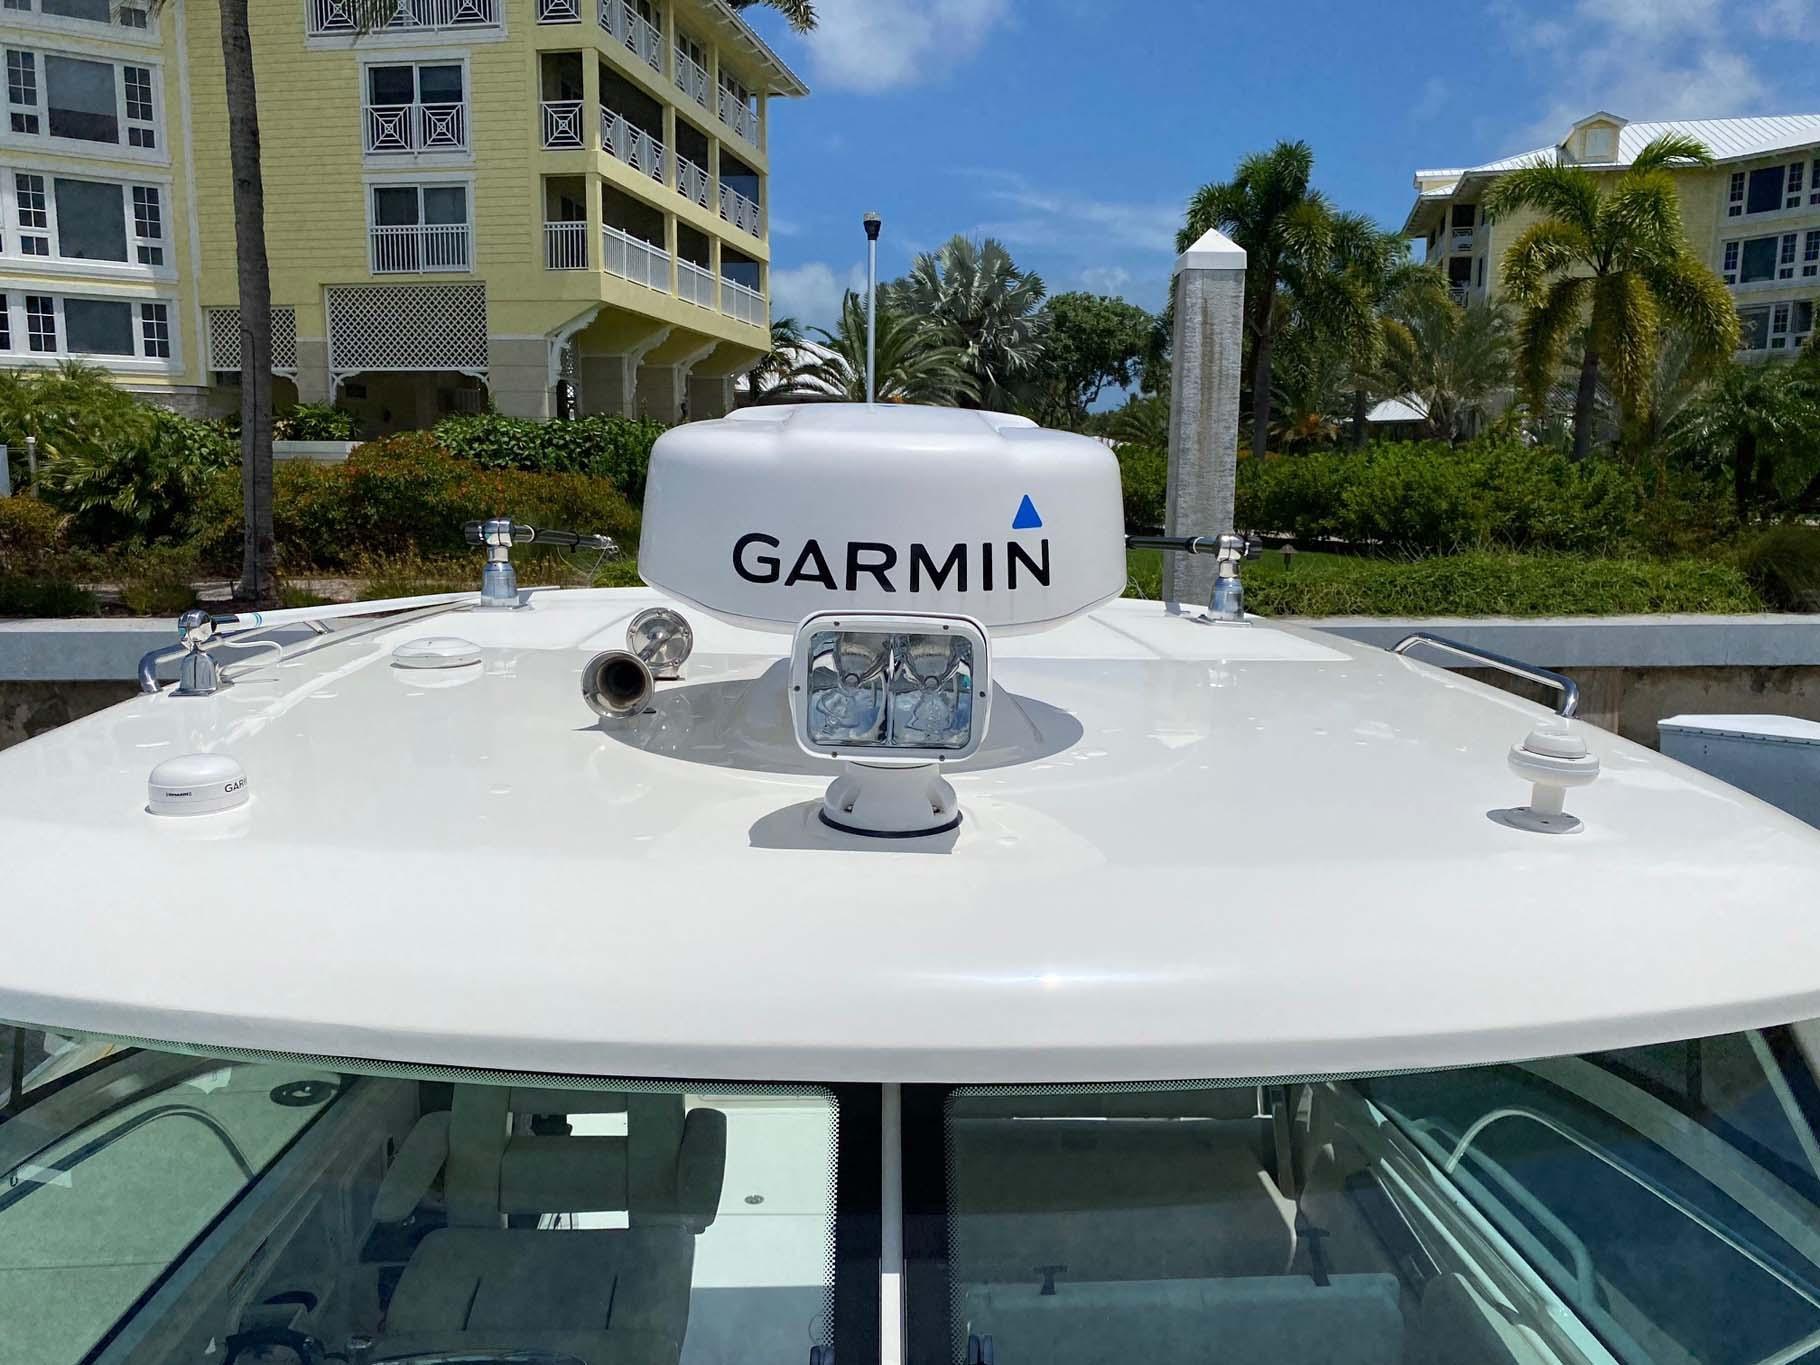 Hardtop with Radar Dome and Spotlight